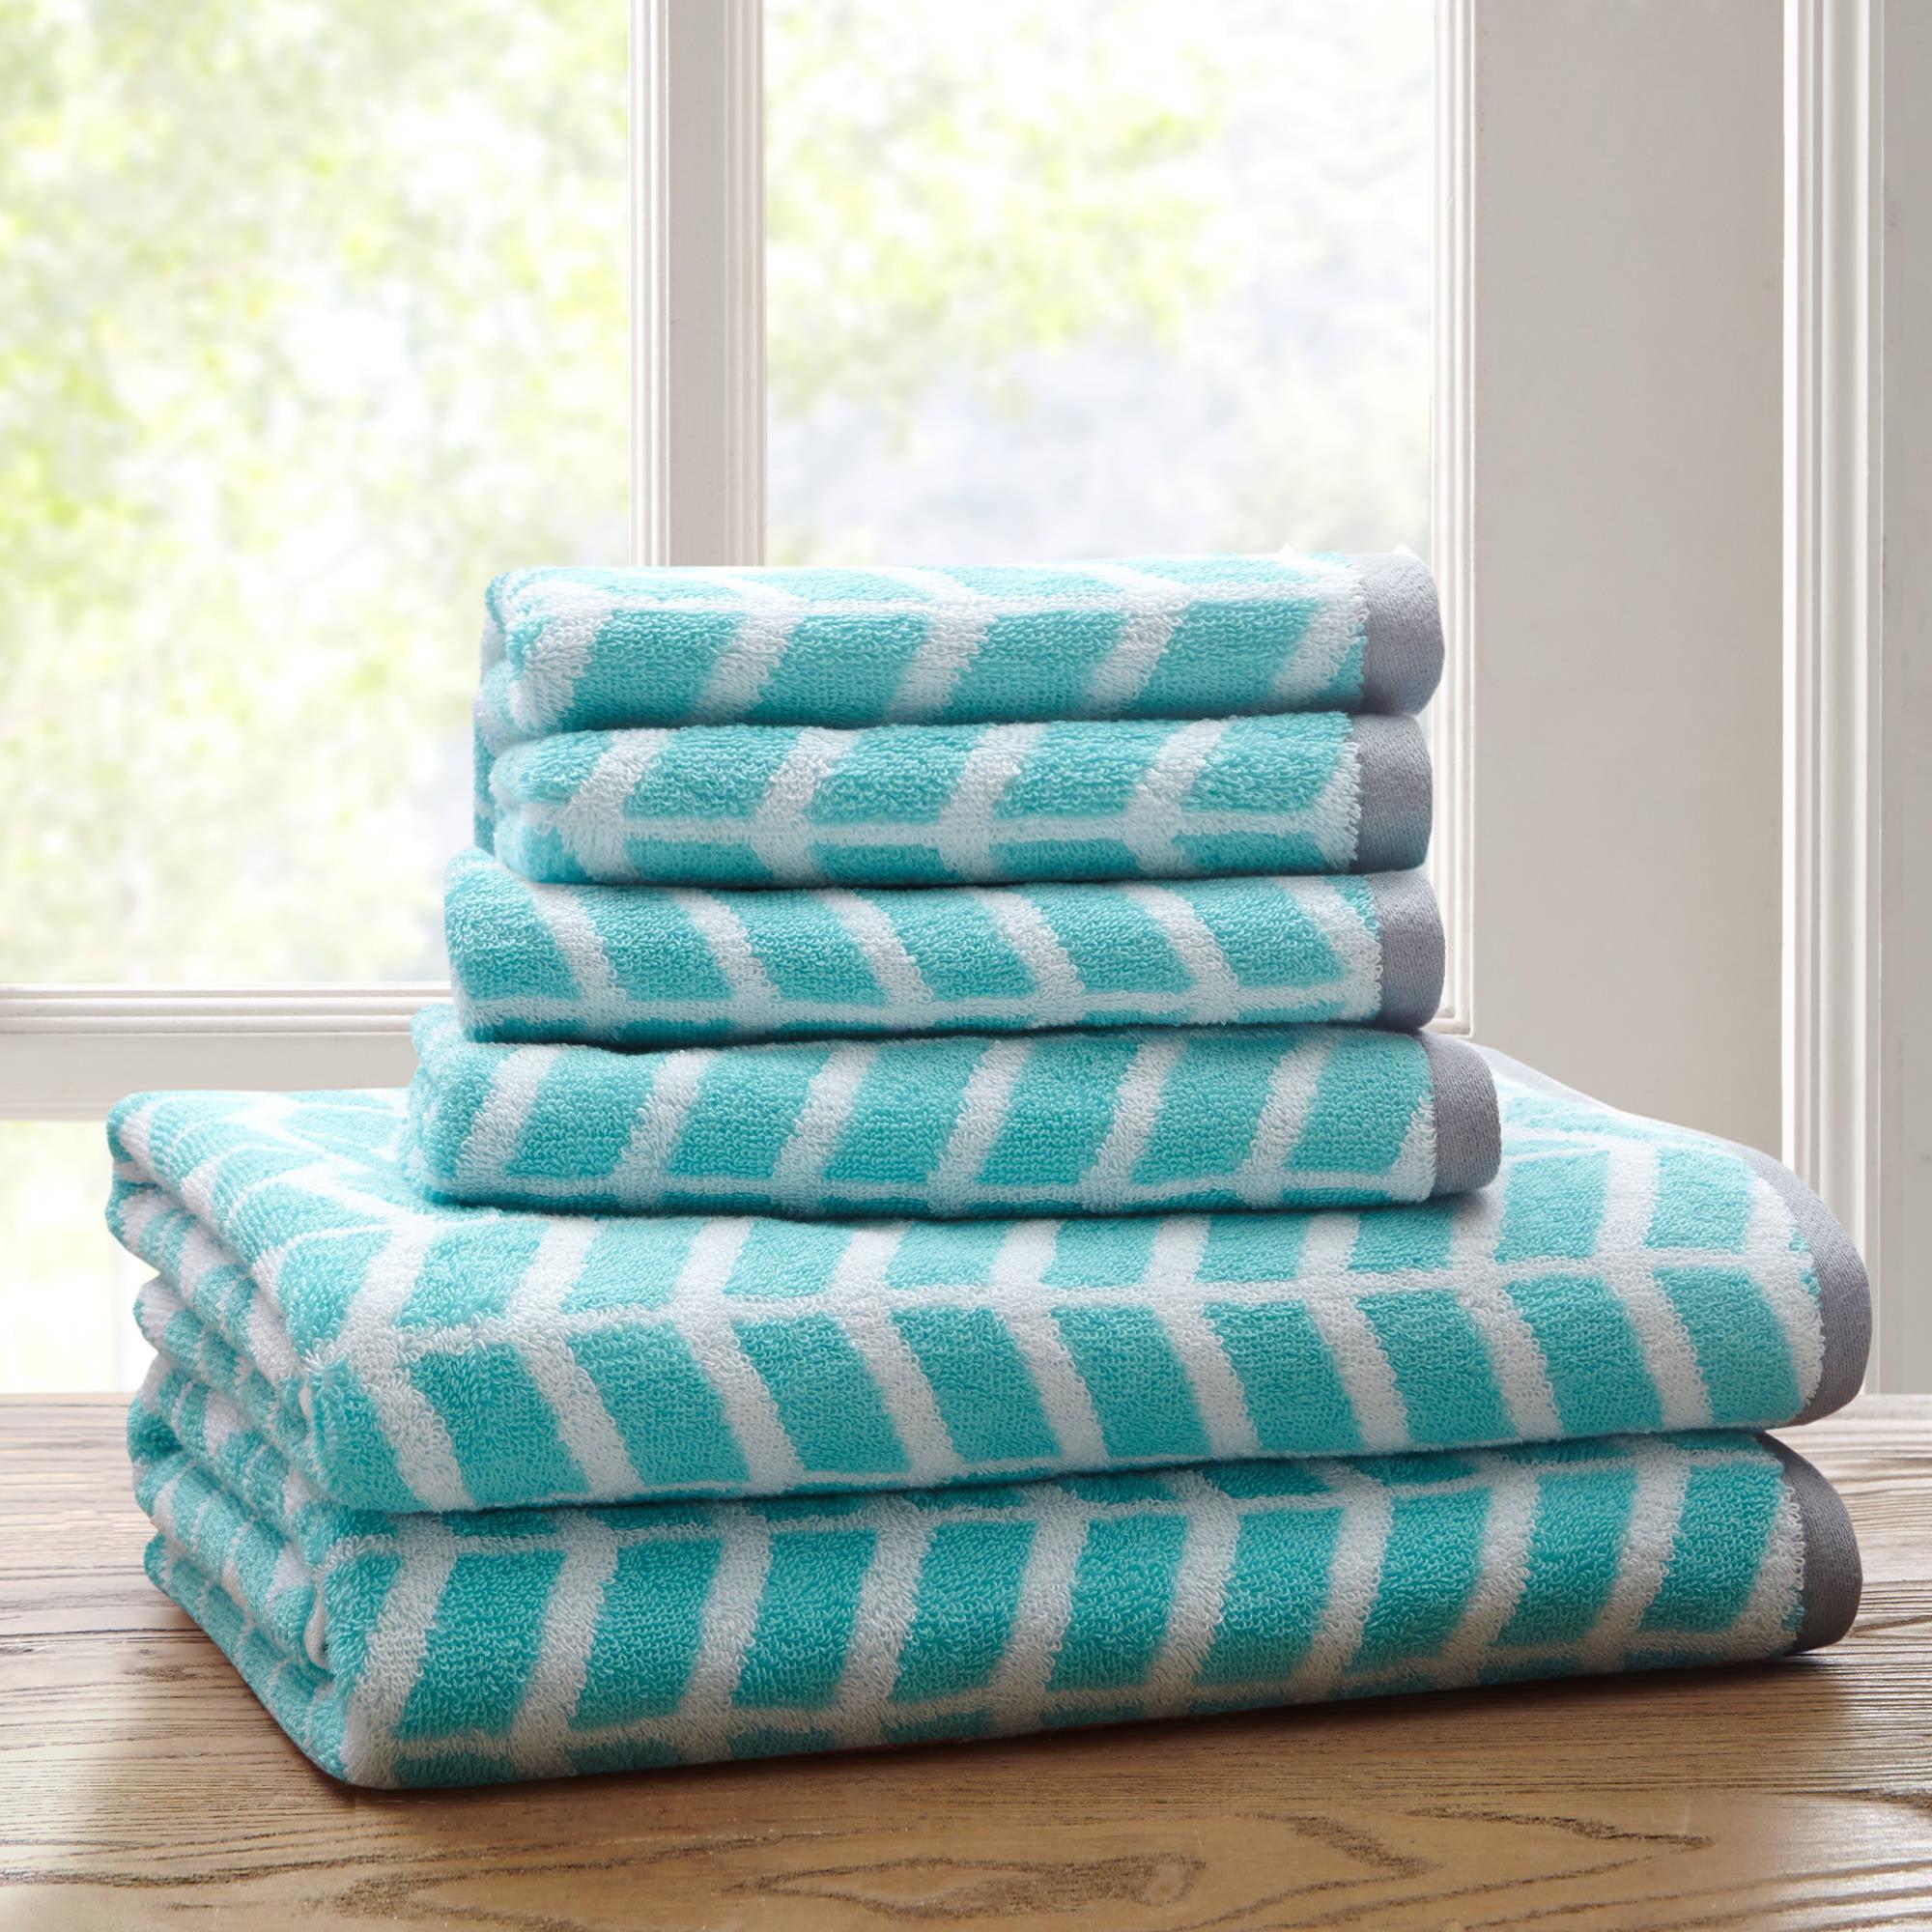 Home Essence Apartment Darcy 6 Piece Cotton Jacquard Towel Set